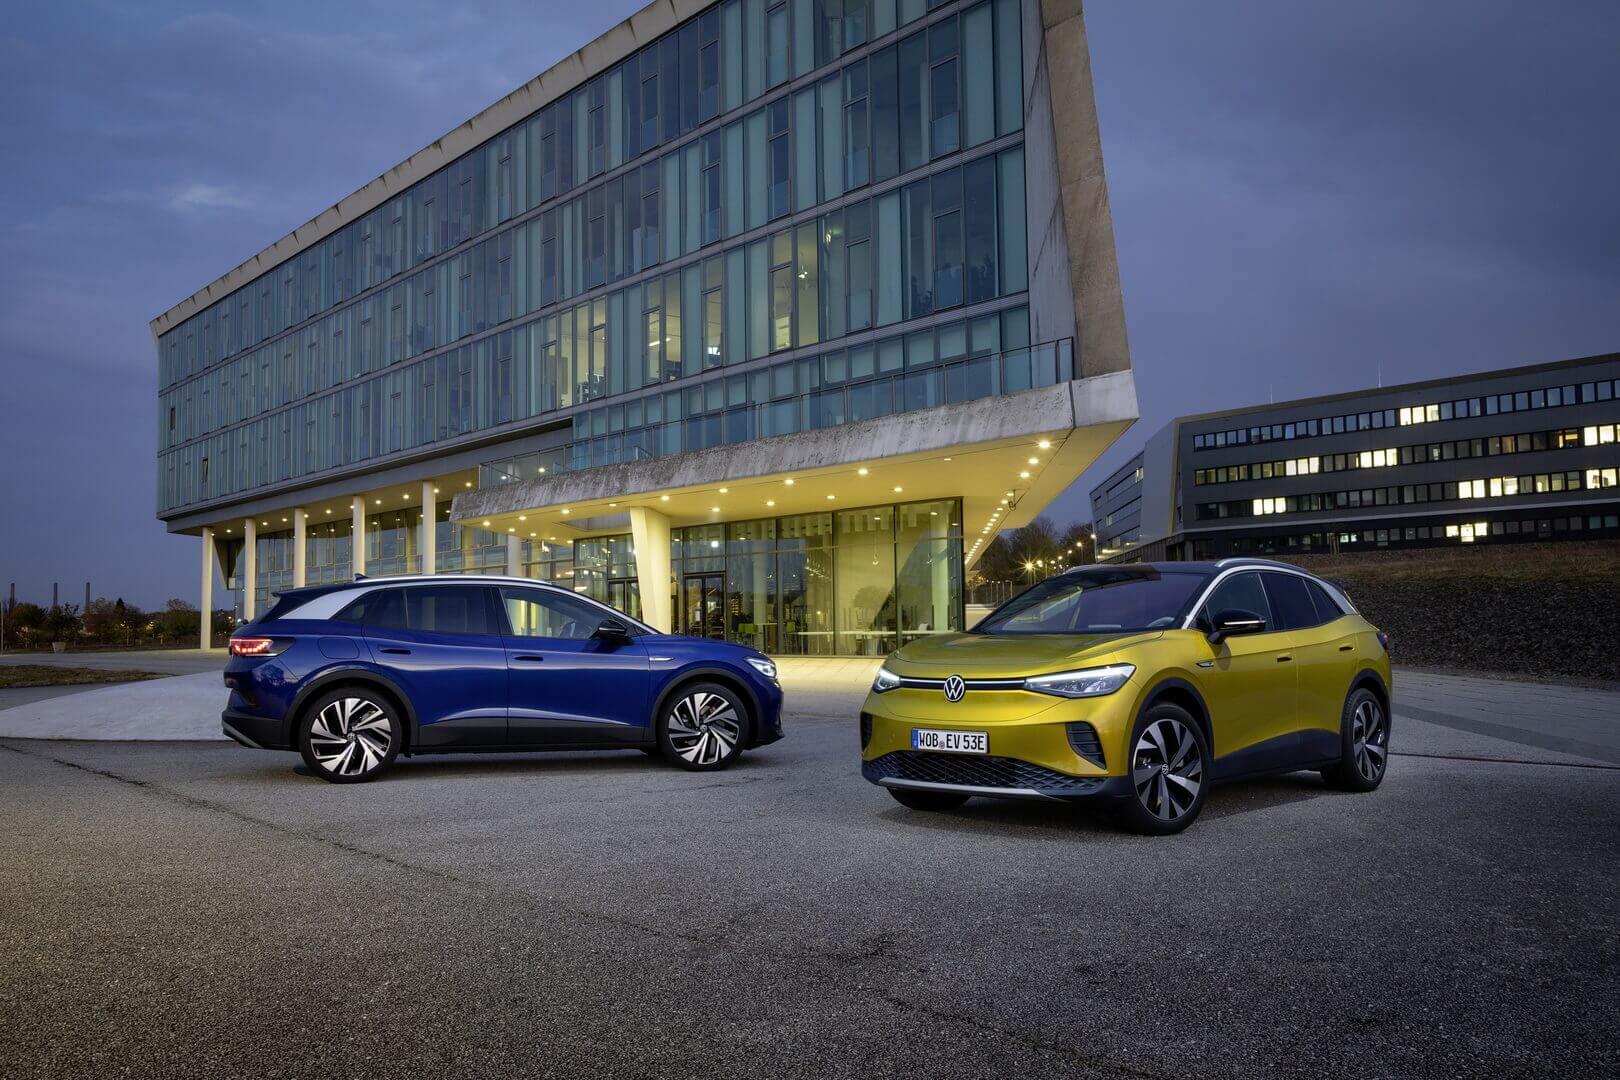 Модели электрического кроссовера Volkswagen ID.4